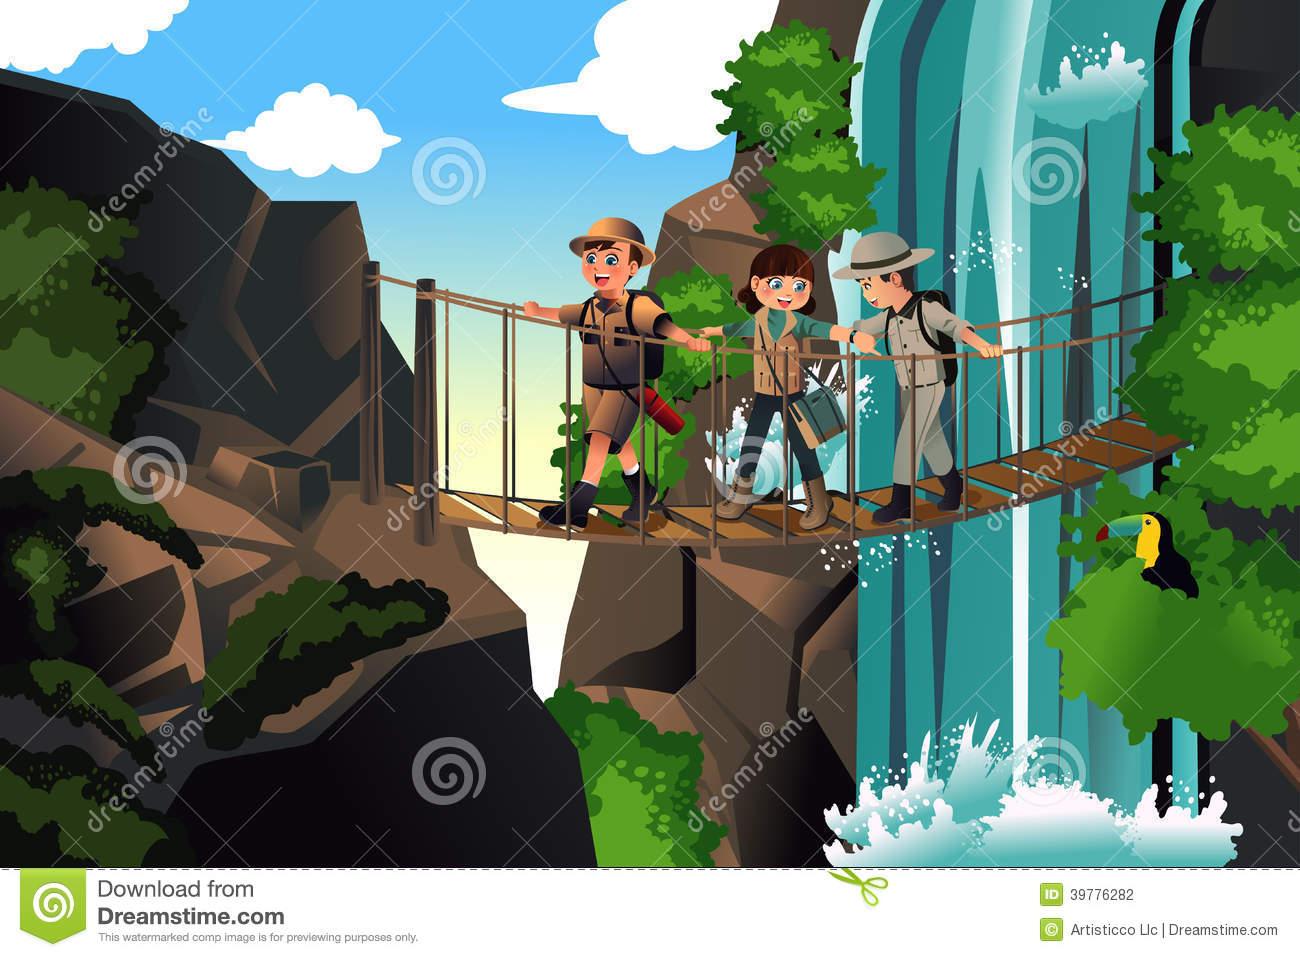 svg stock On an trip panda. Kids adventure clipart